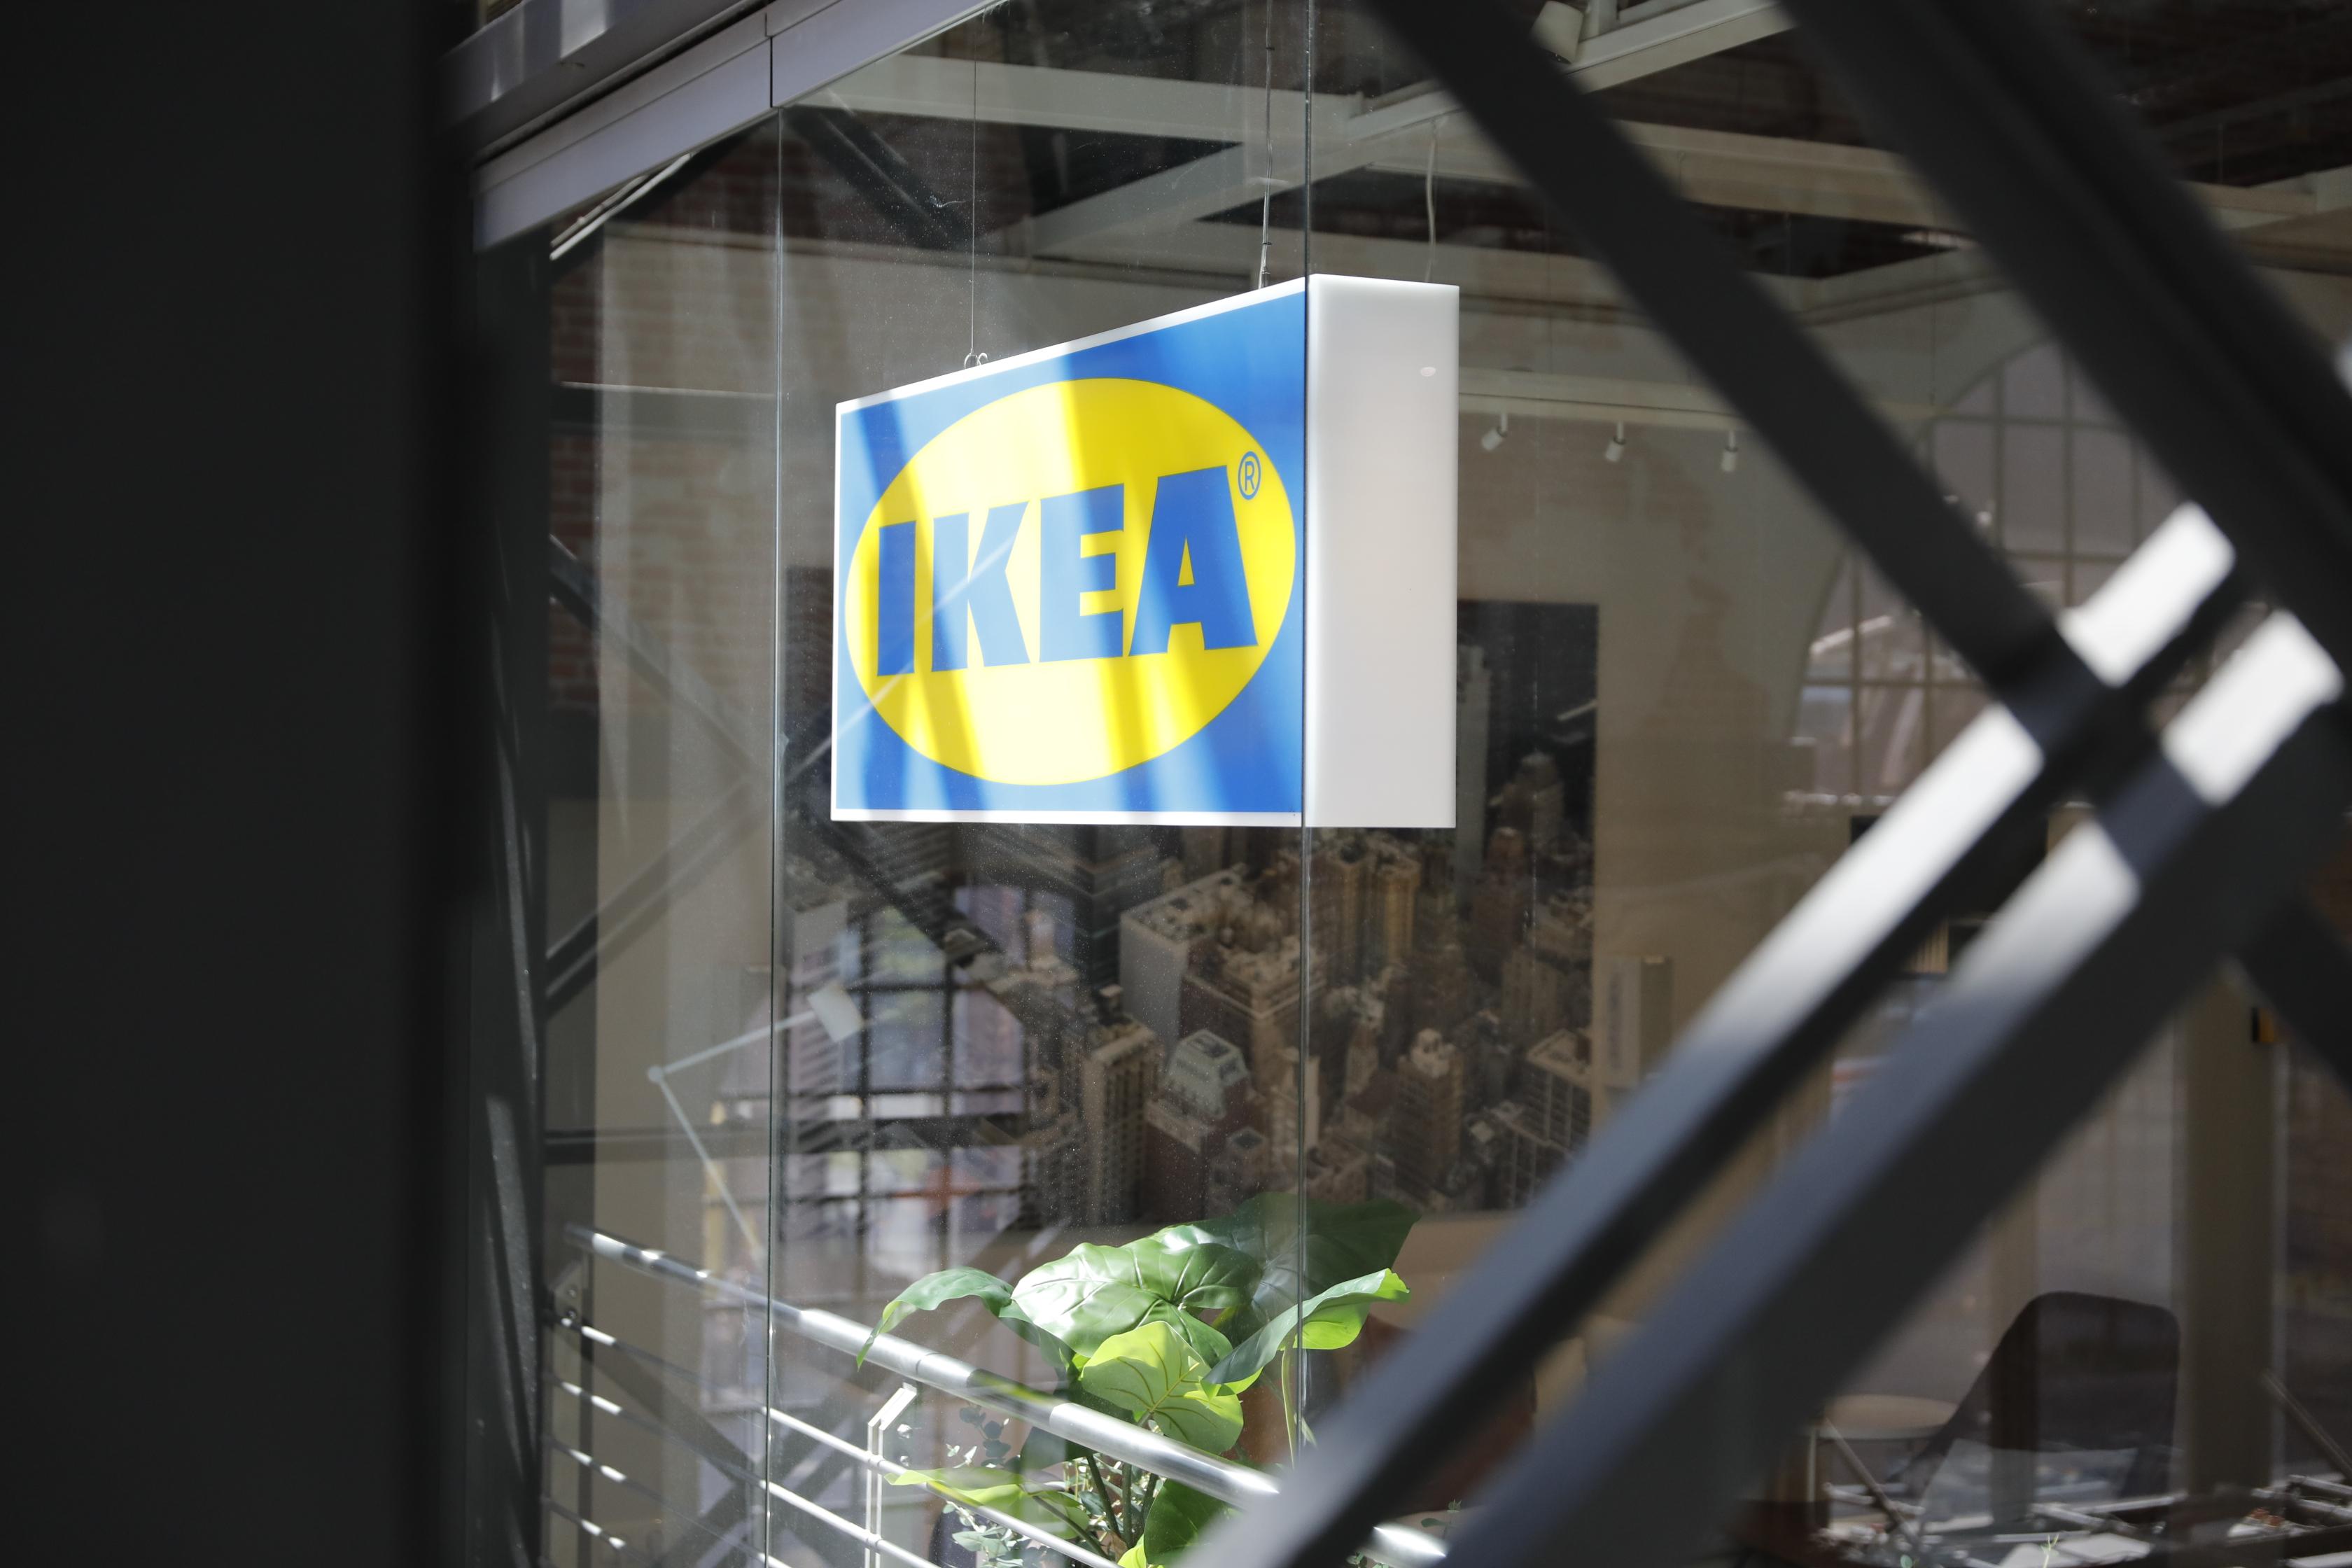 Ikea testet neue Pop-up-Formate